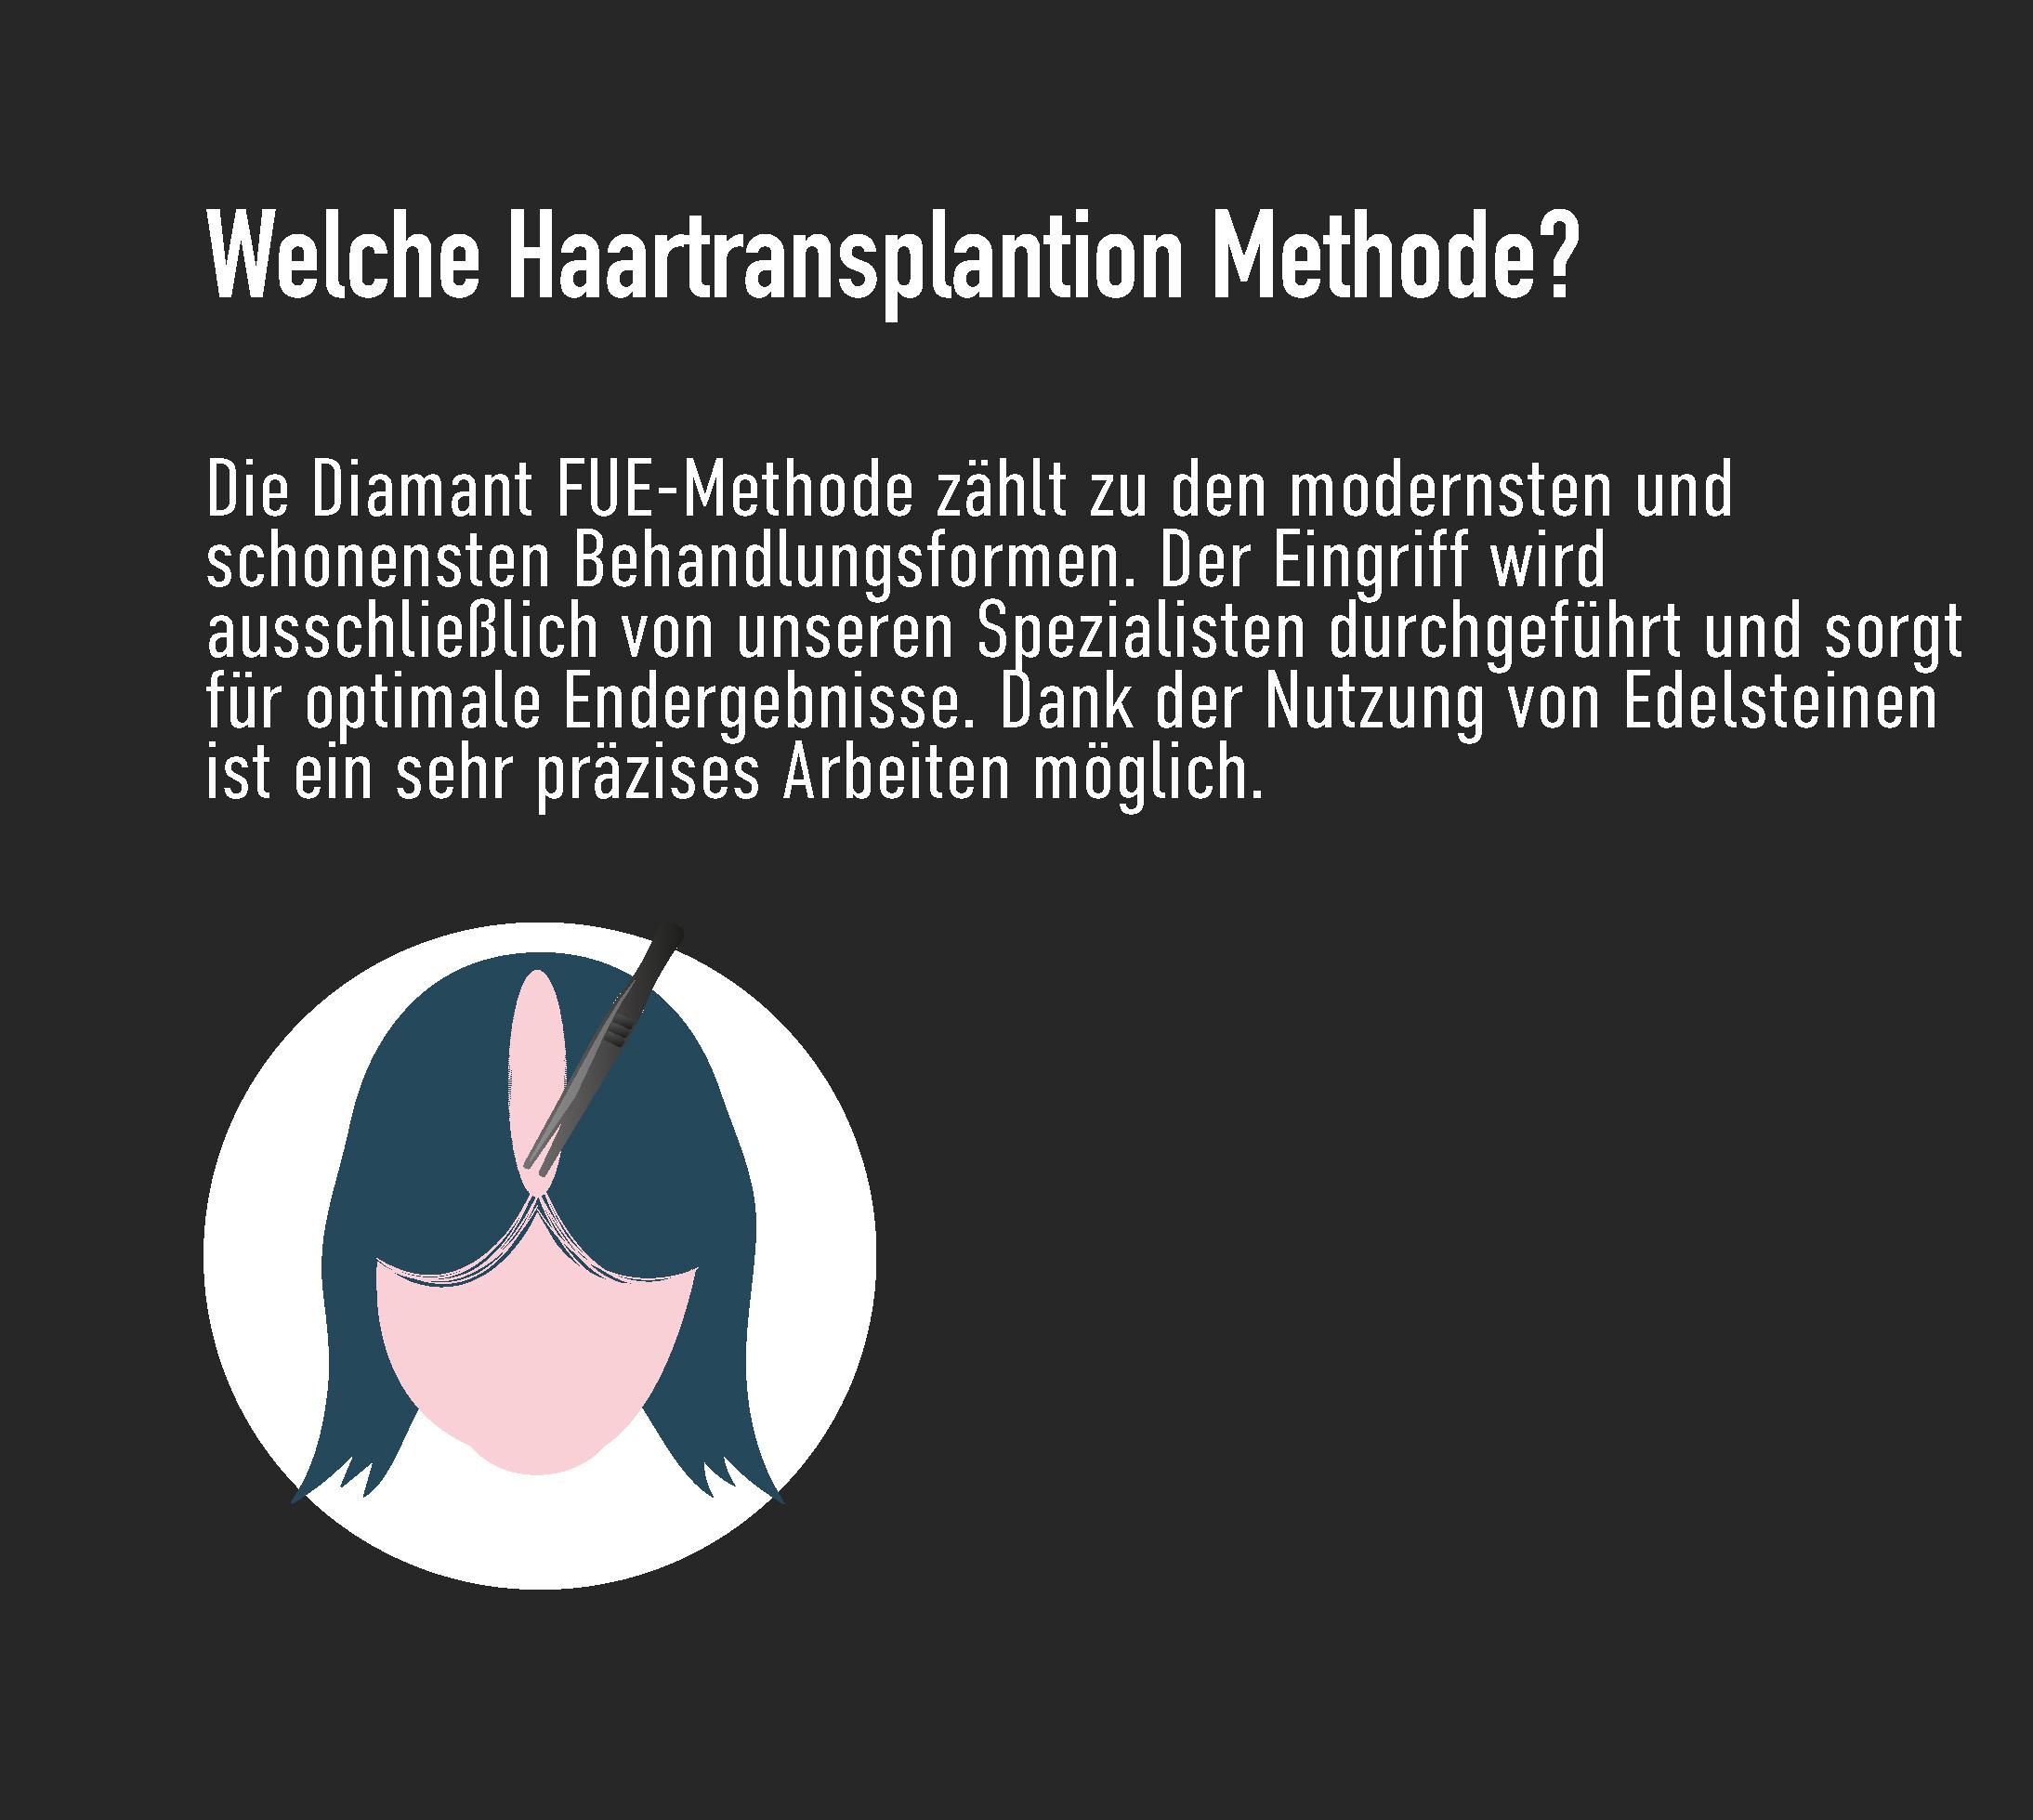 haartransplantation frauen - keine Kopfrasur